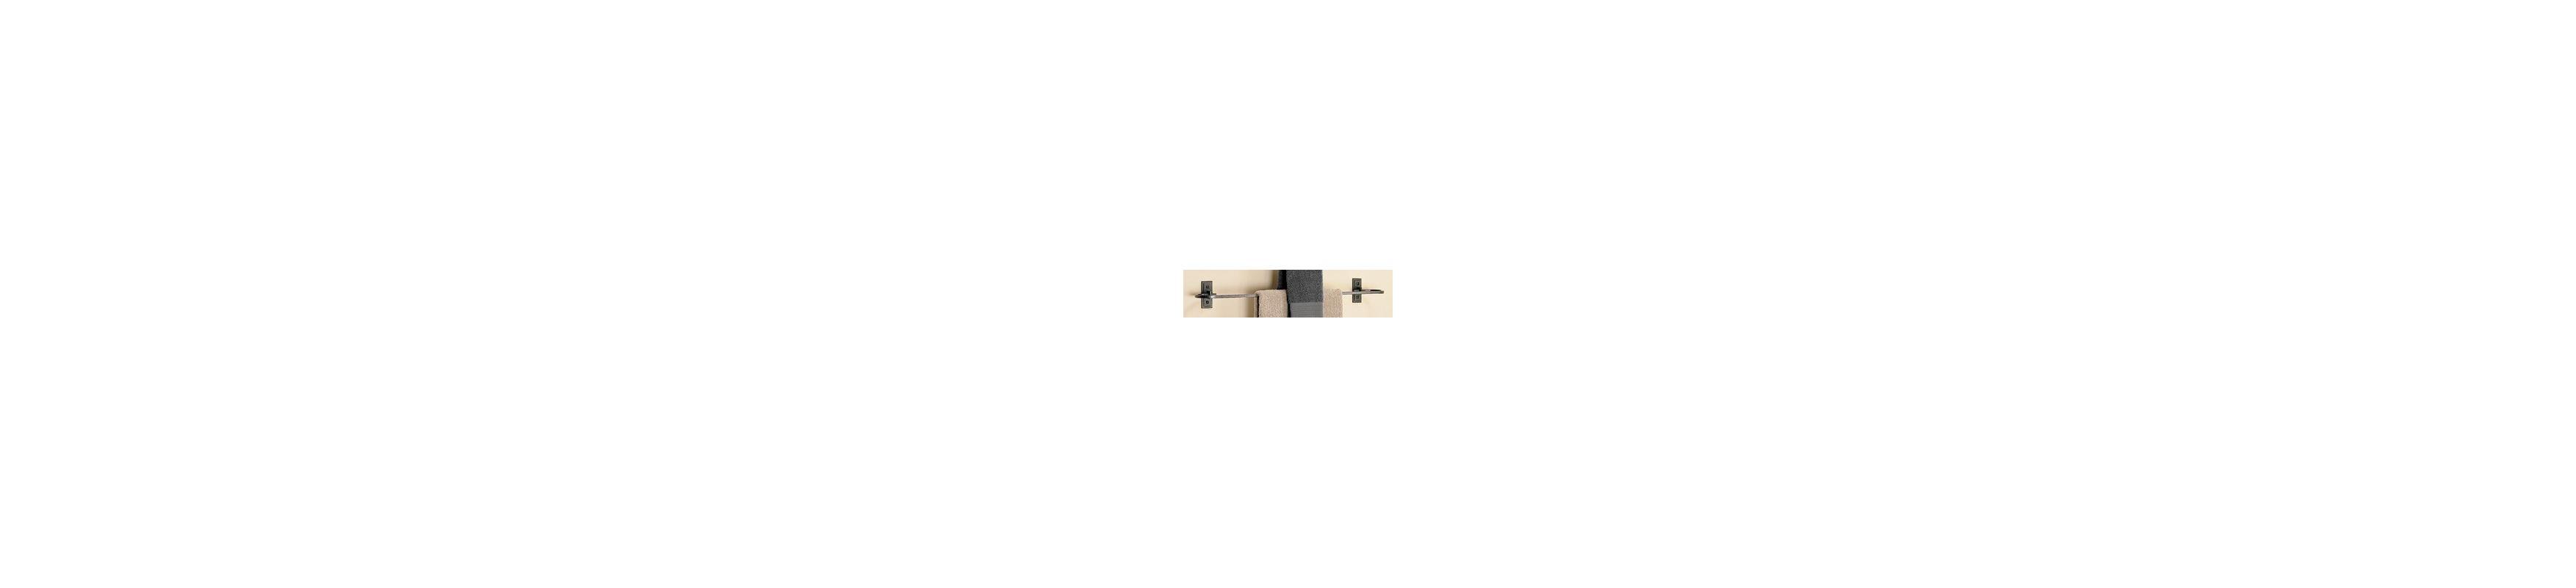 "Hubbardton Forge 841024 29"" Metra Curved Towel Bar Natural Iron"